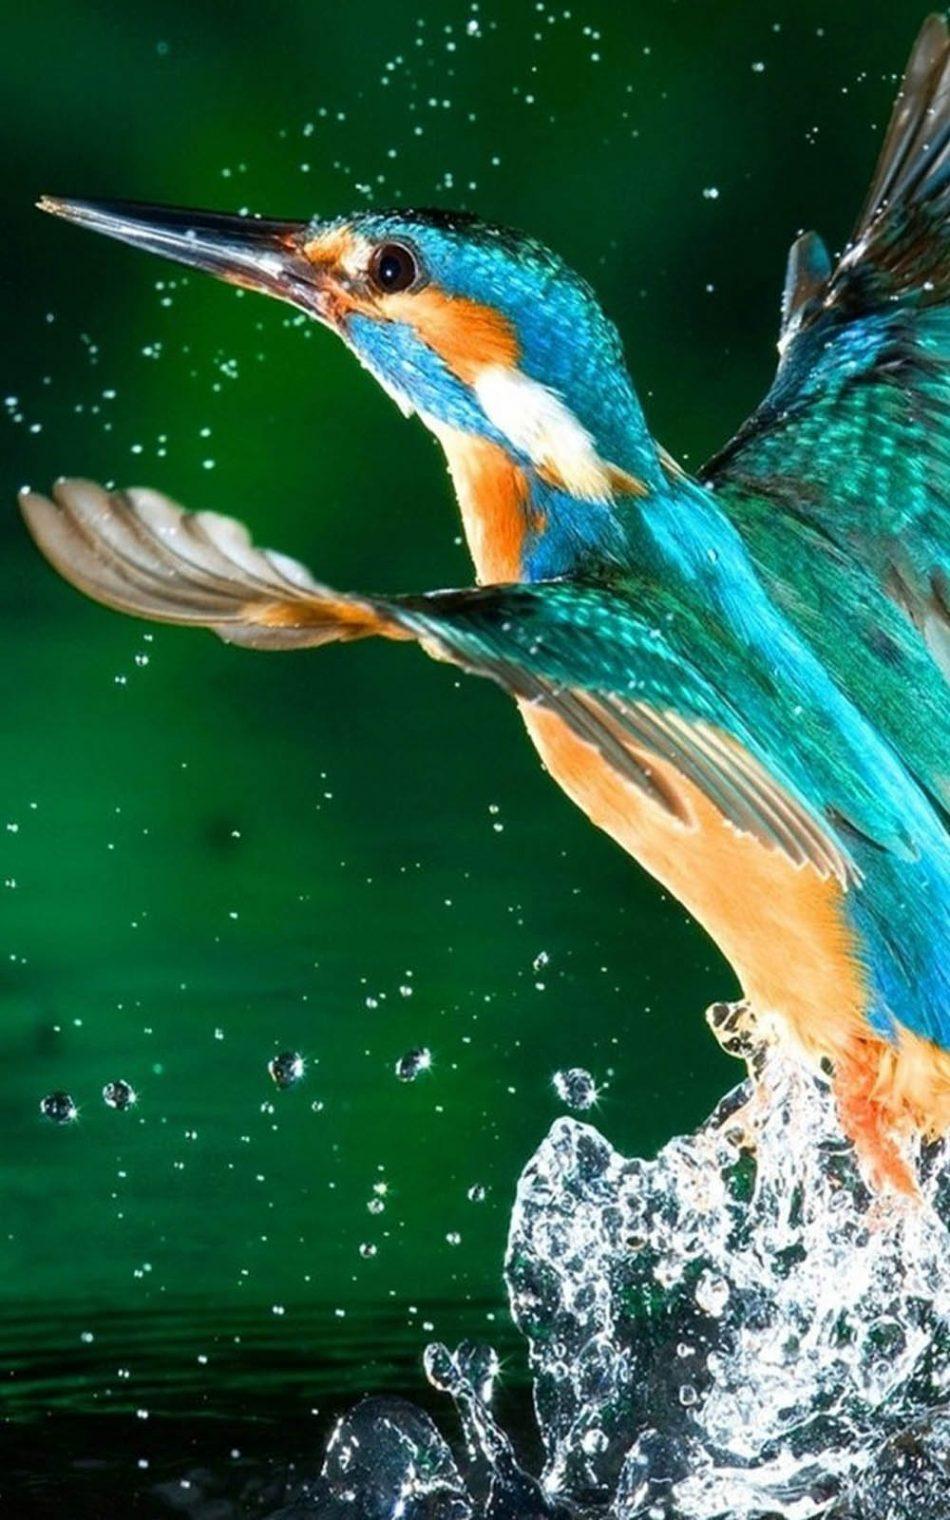 Kingfisher Calendar Wallpaper Download : Download kingfisher bird free pure k ultra hd mobile